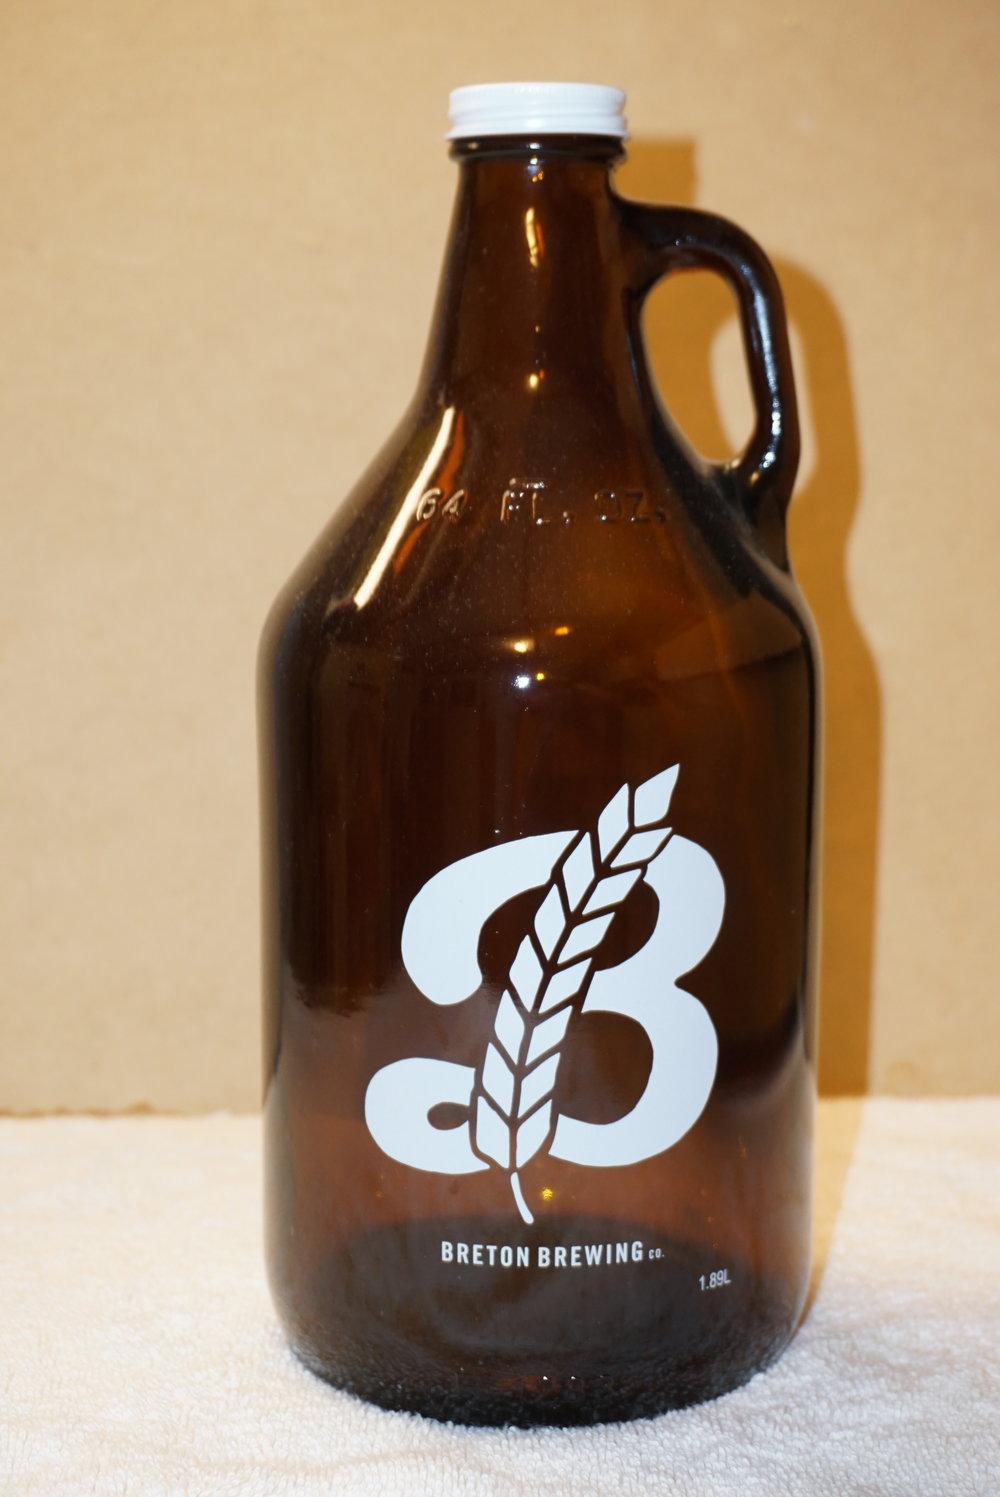 GR - Breton Brewing (NS)